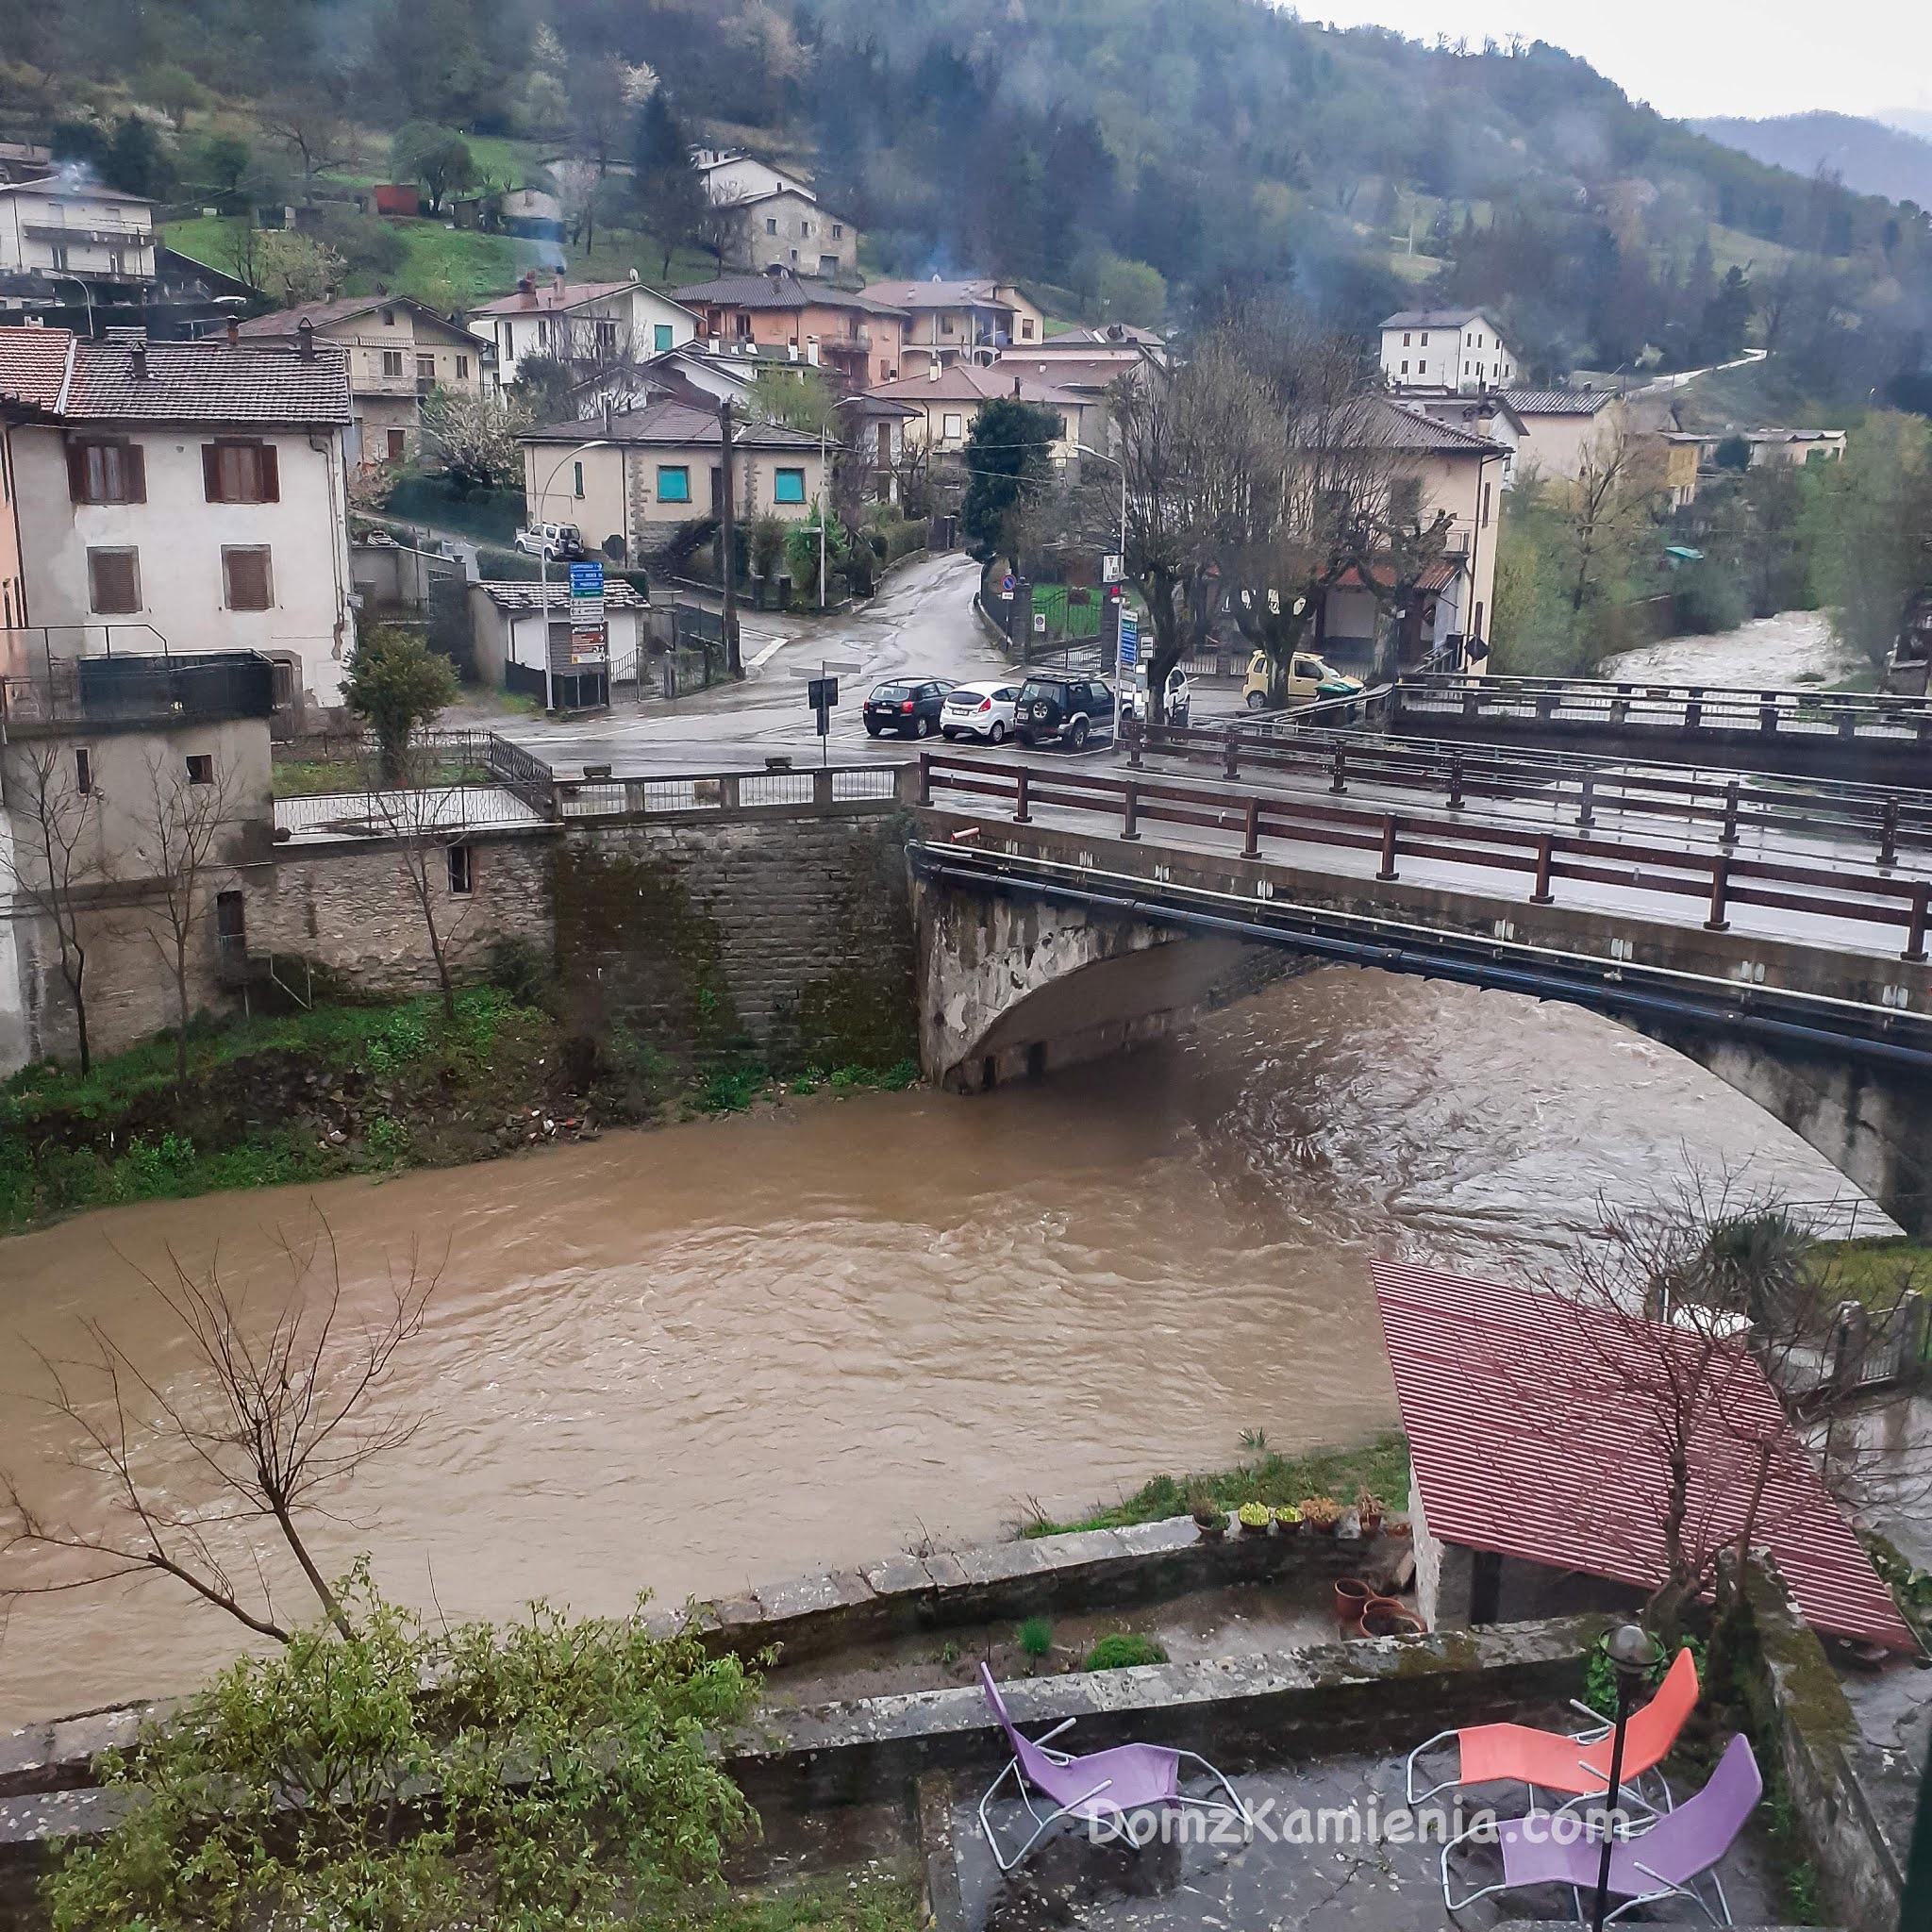 Biforco - Marradi, Toskania nieznana